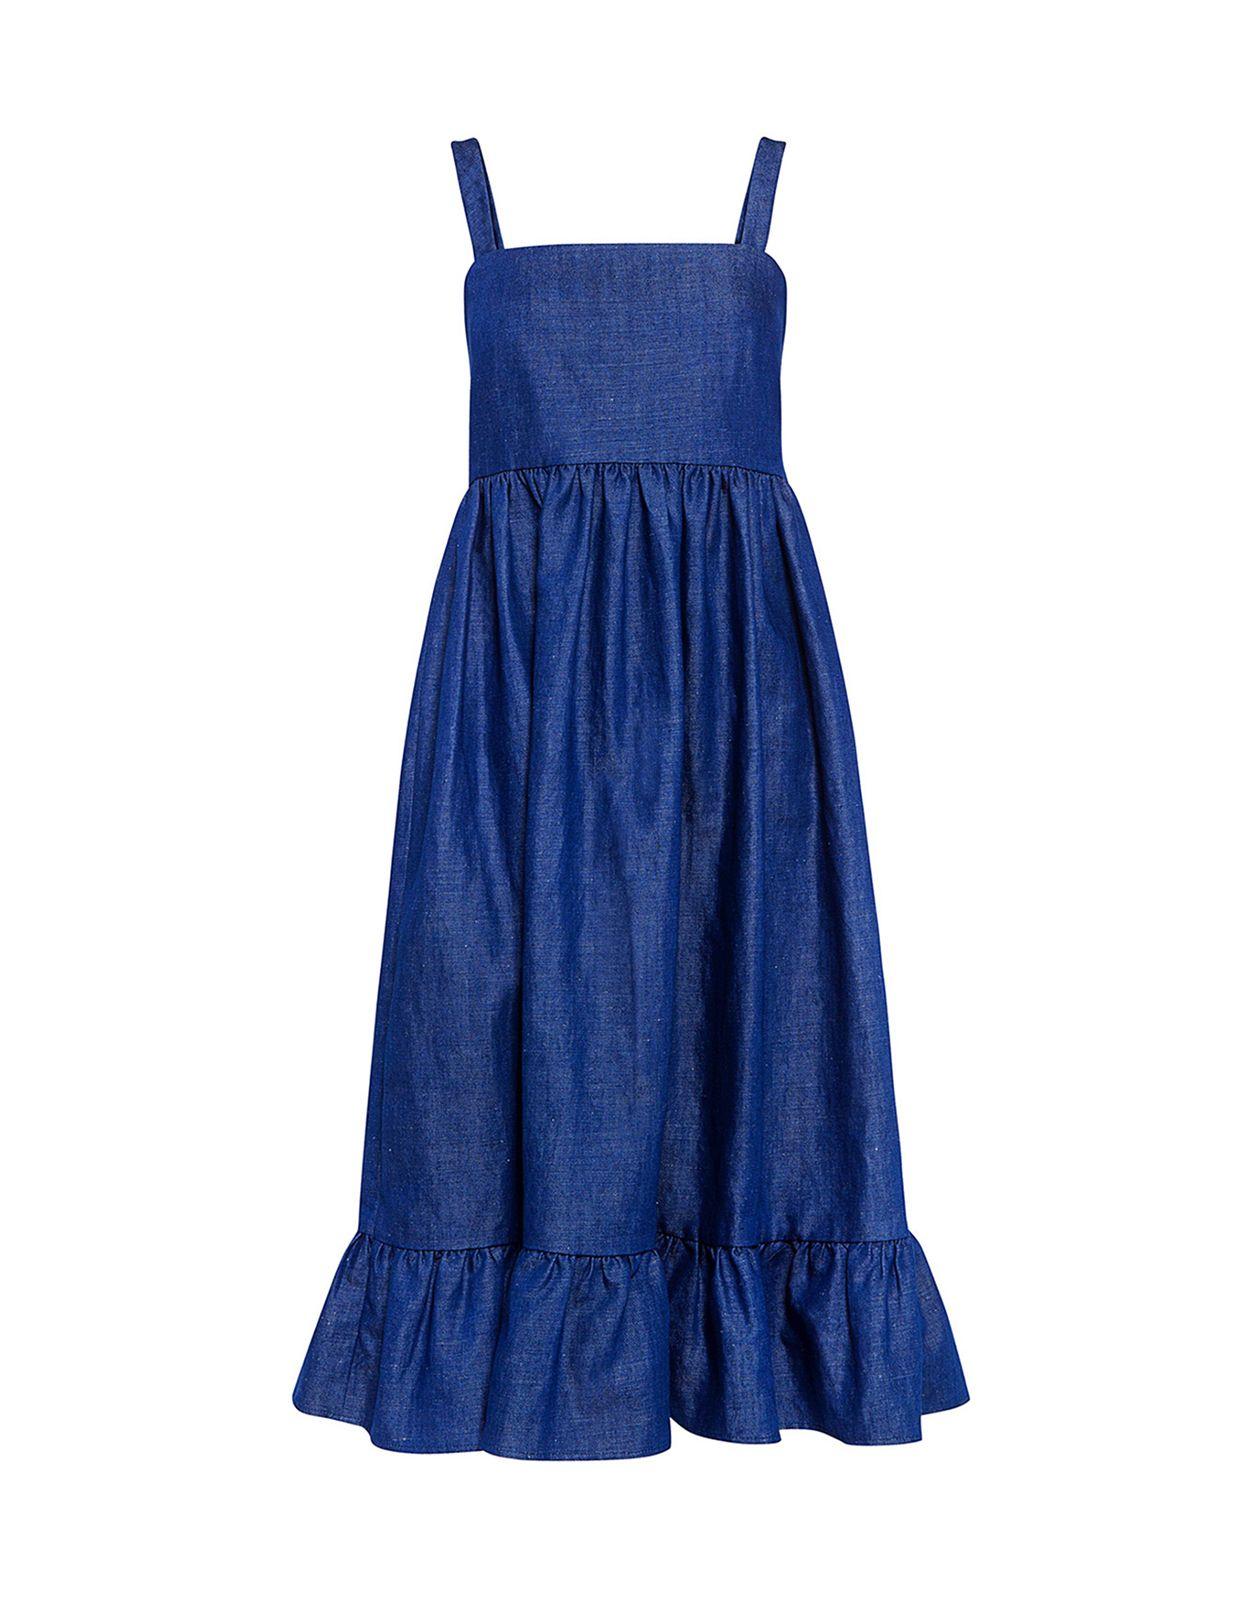 Co Ruffled Denim Dress Dresses Denim Ifchic Com Denim Ruffle Dress Denim Dress Waistline Dress [ 1600 x 1250 Pixel ]